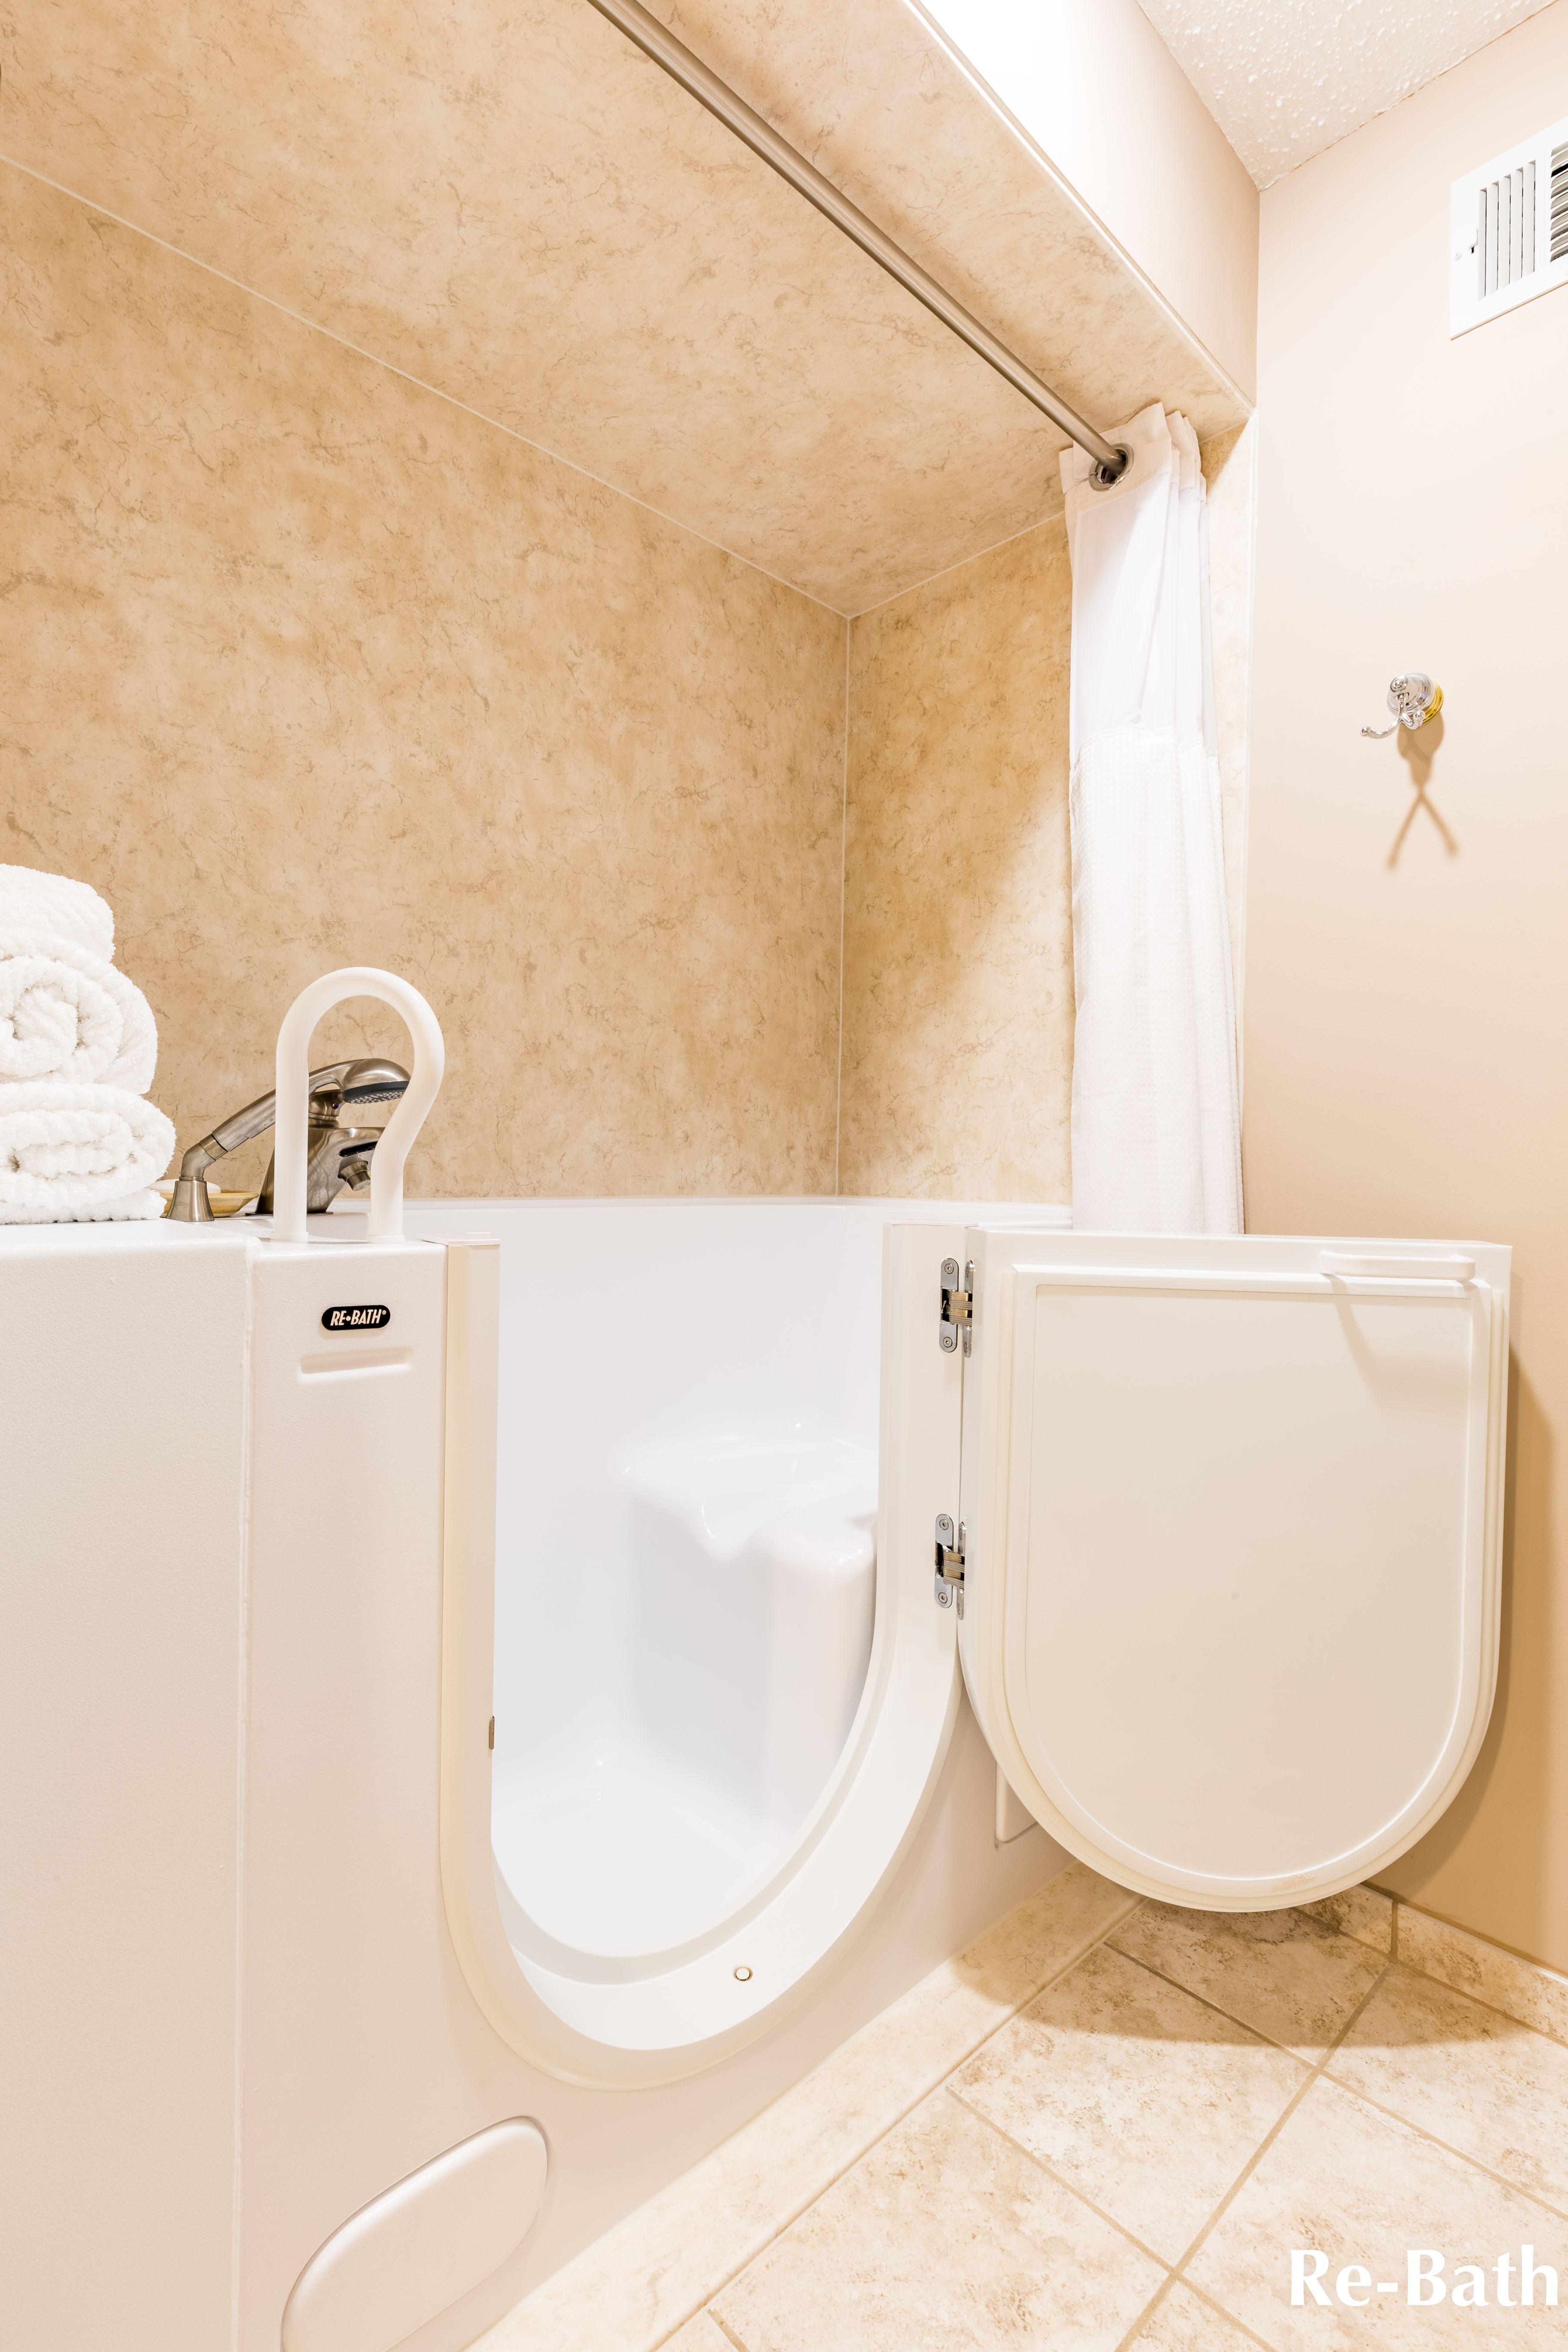 Re Bath Walk In Tub With Durabath Ssp Acrylic Surround In Neutral